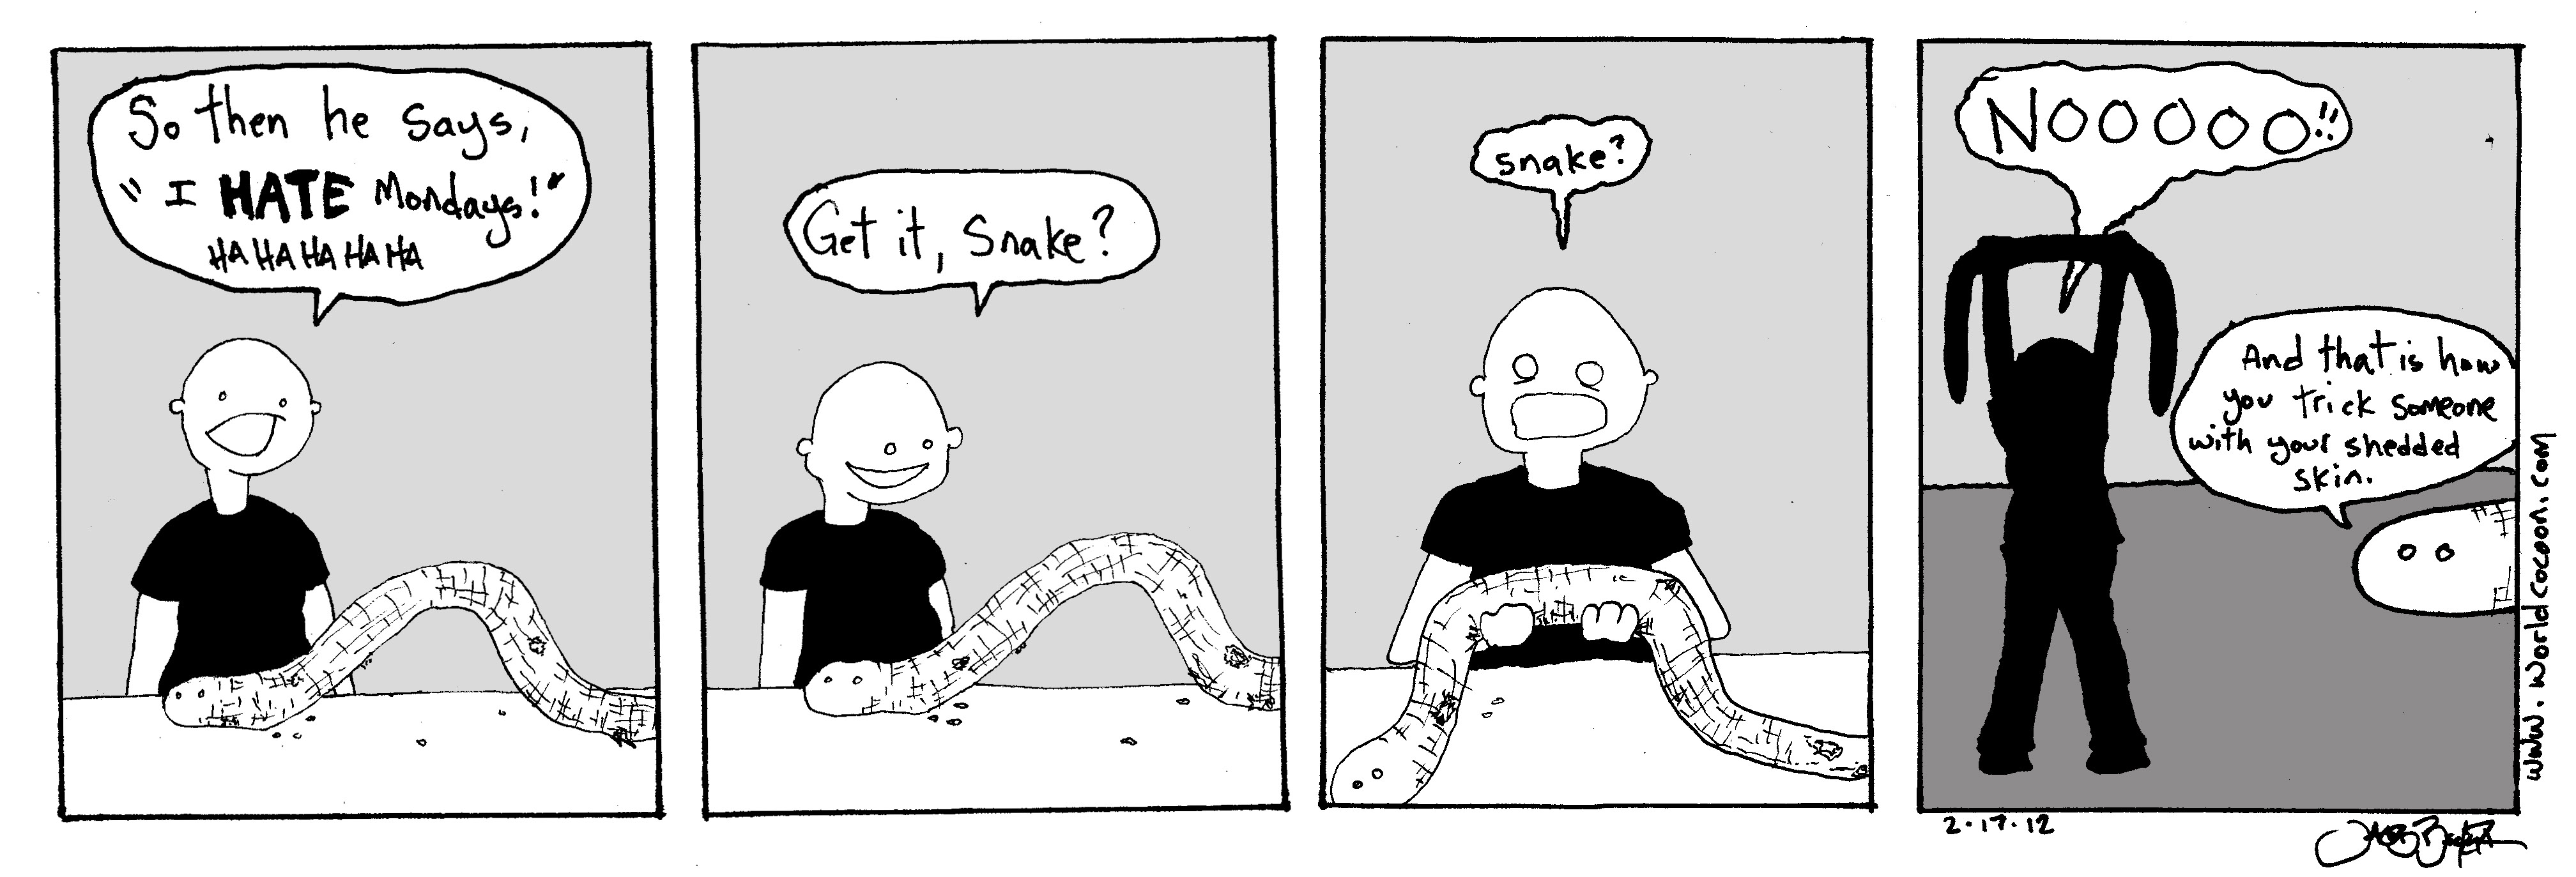 02/17/2012